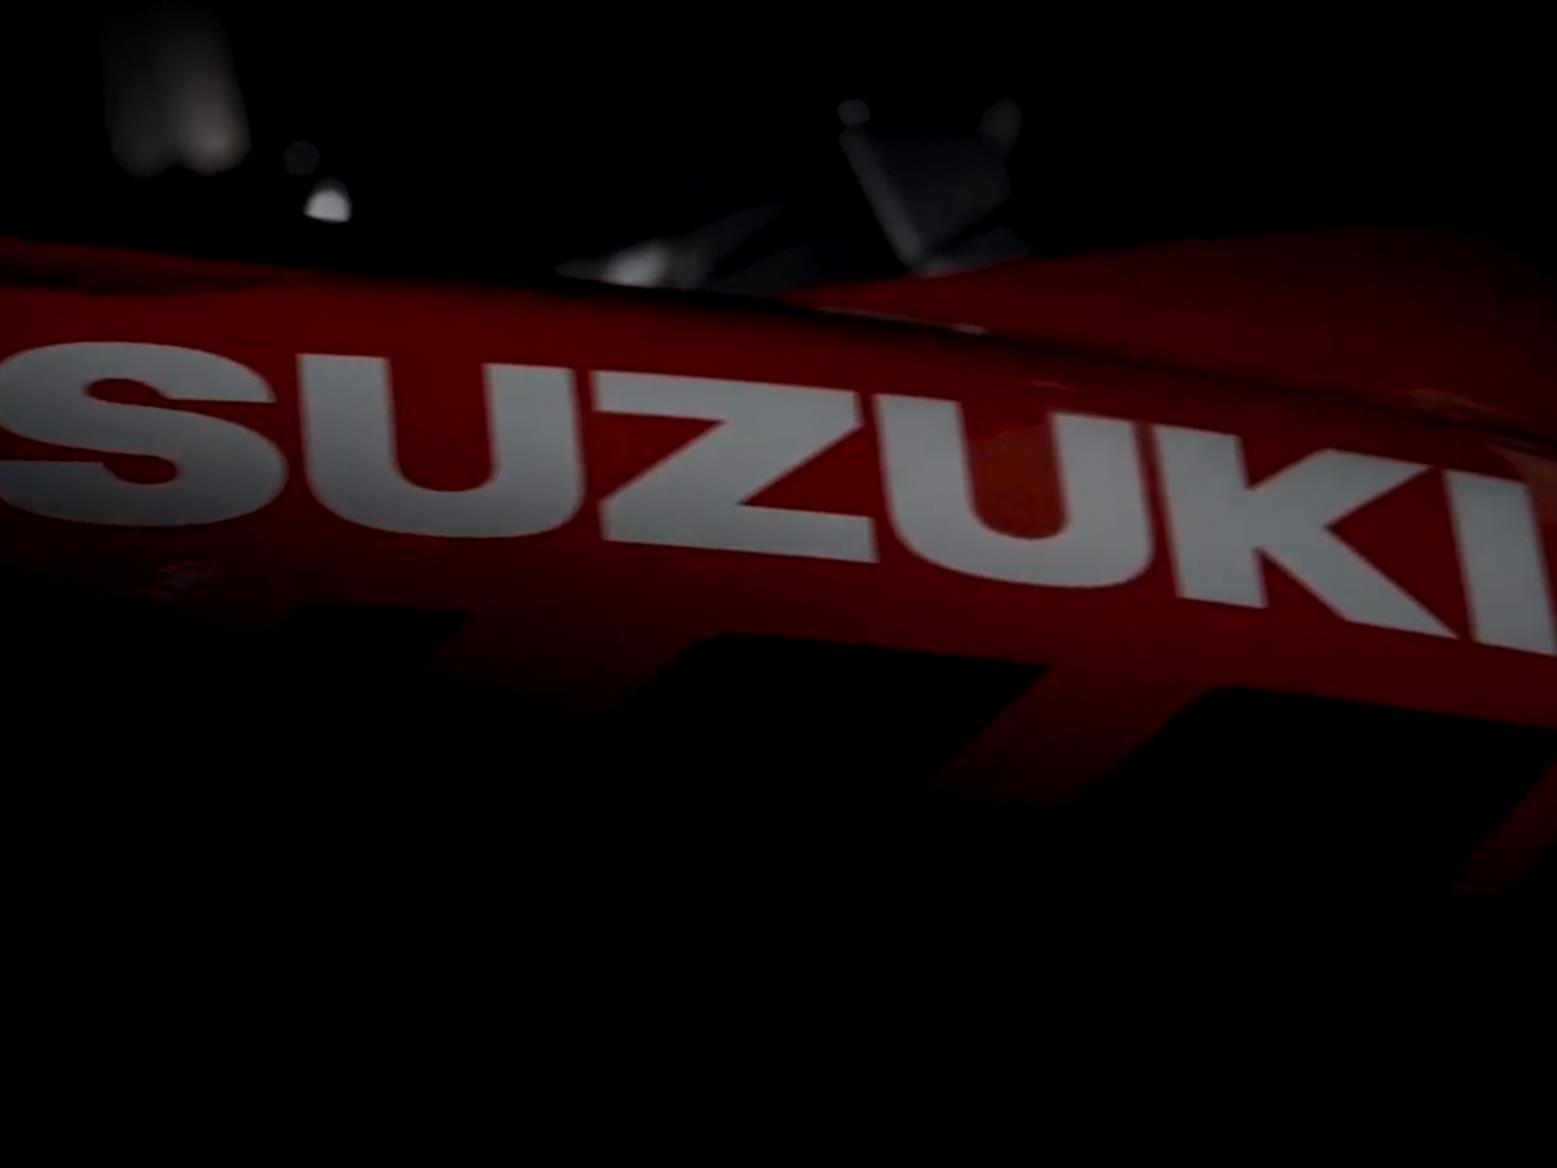 Suzuki tease all-new V-Strom for 2020 - full reveal at Eicma!